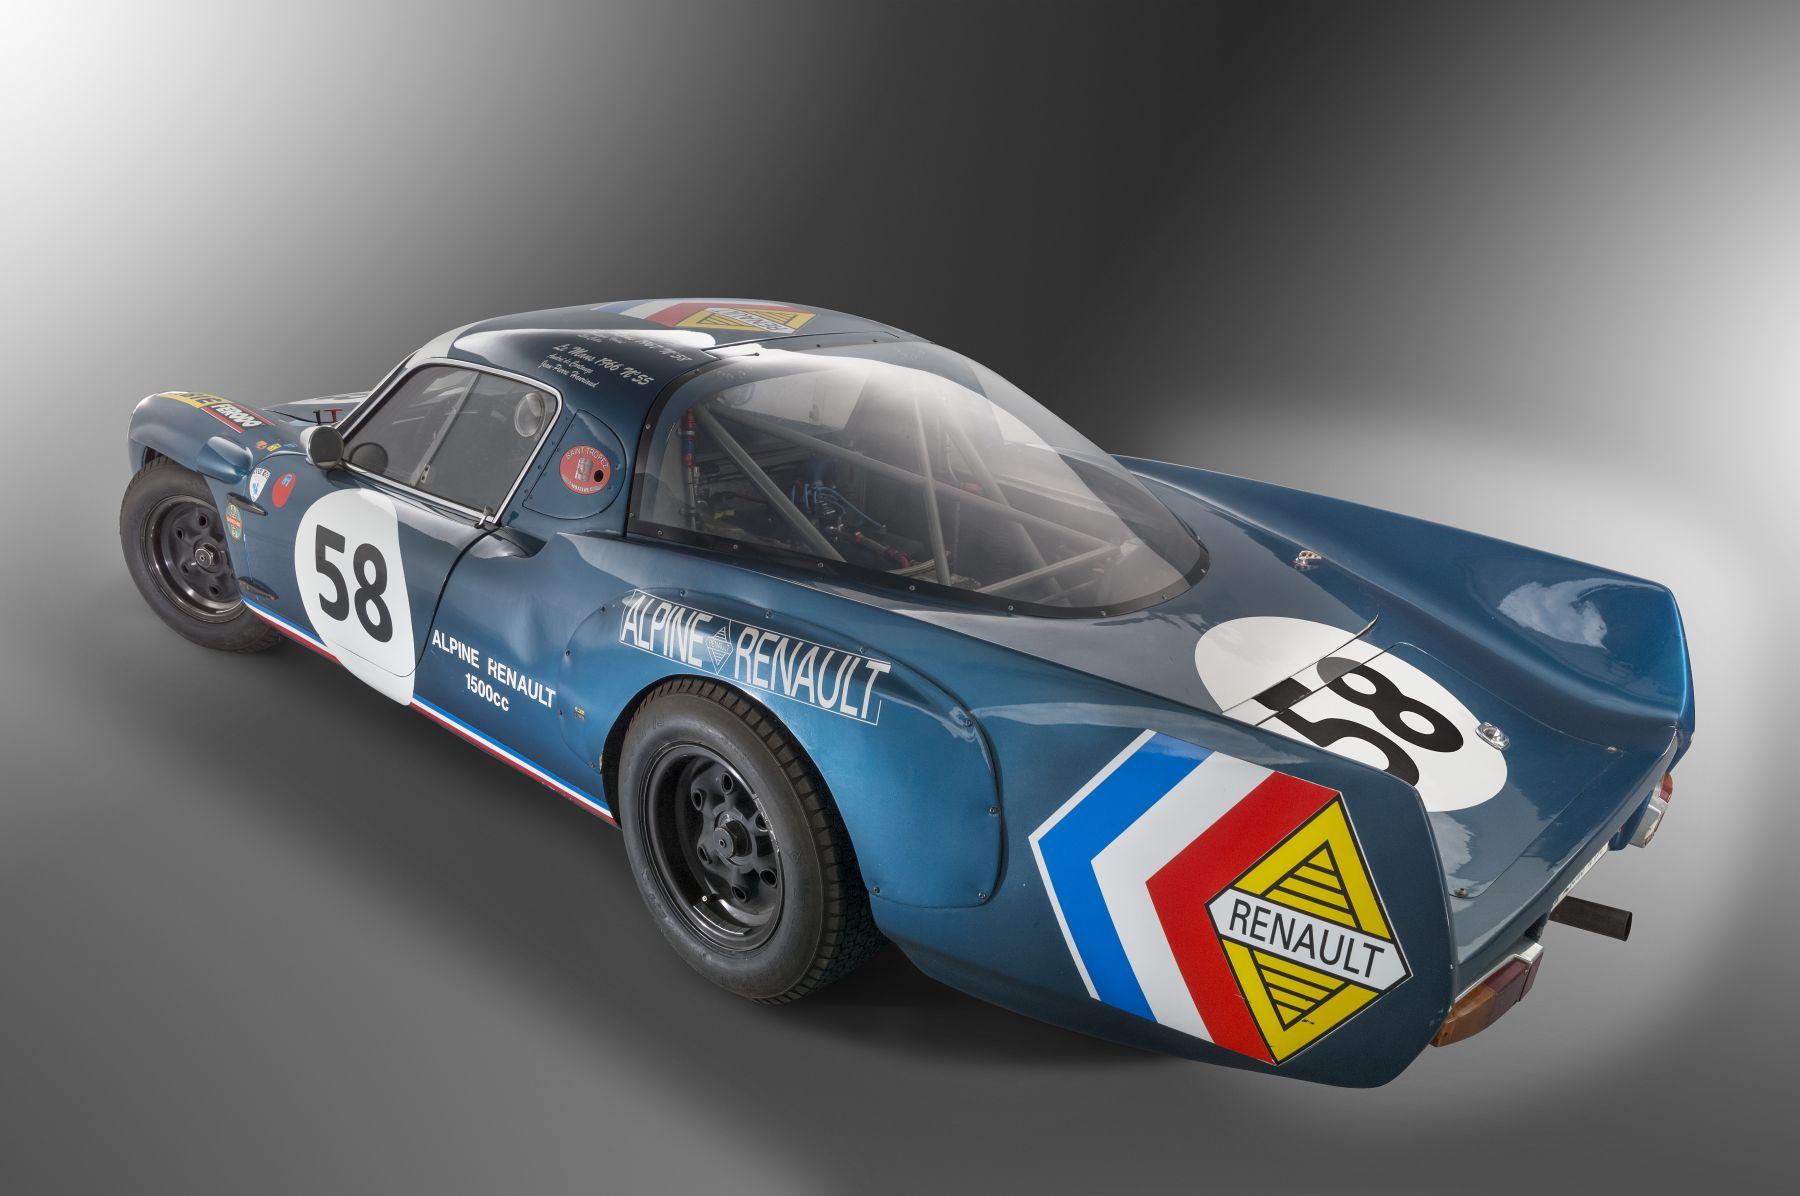 Alpine A210 Le Mans 1966 classicdriver com 20_10